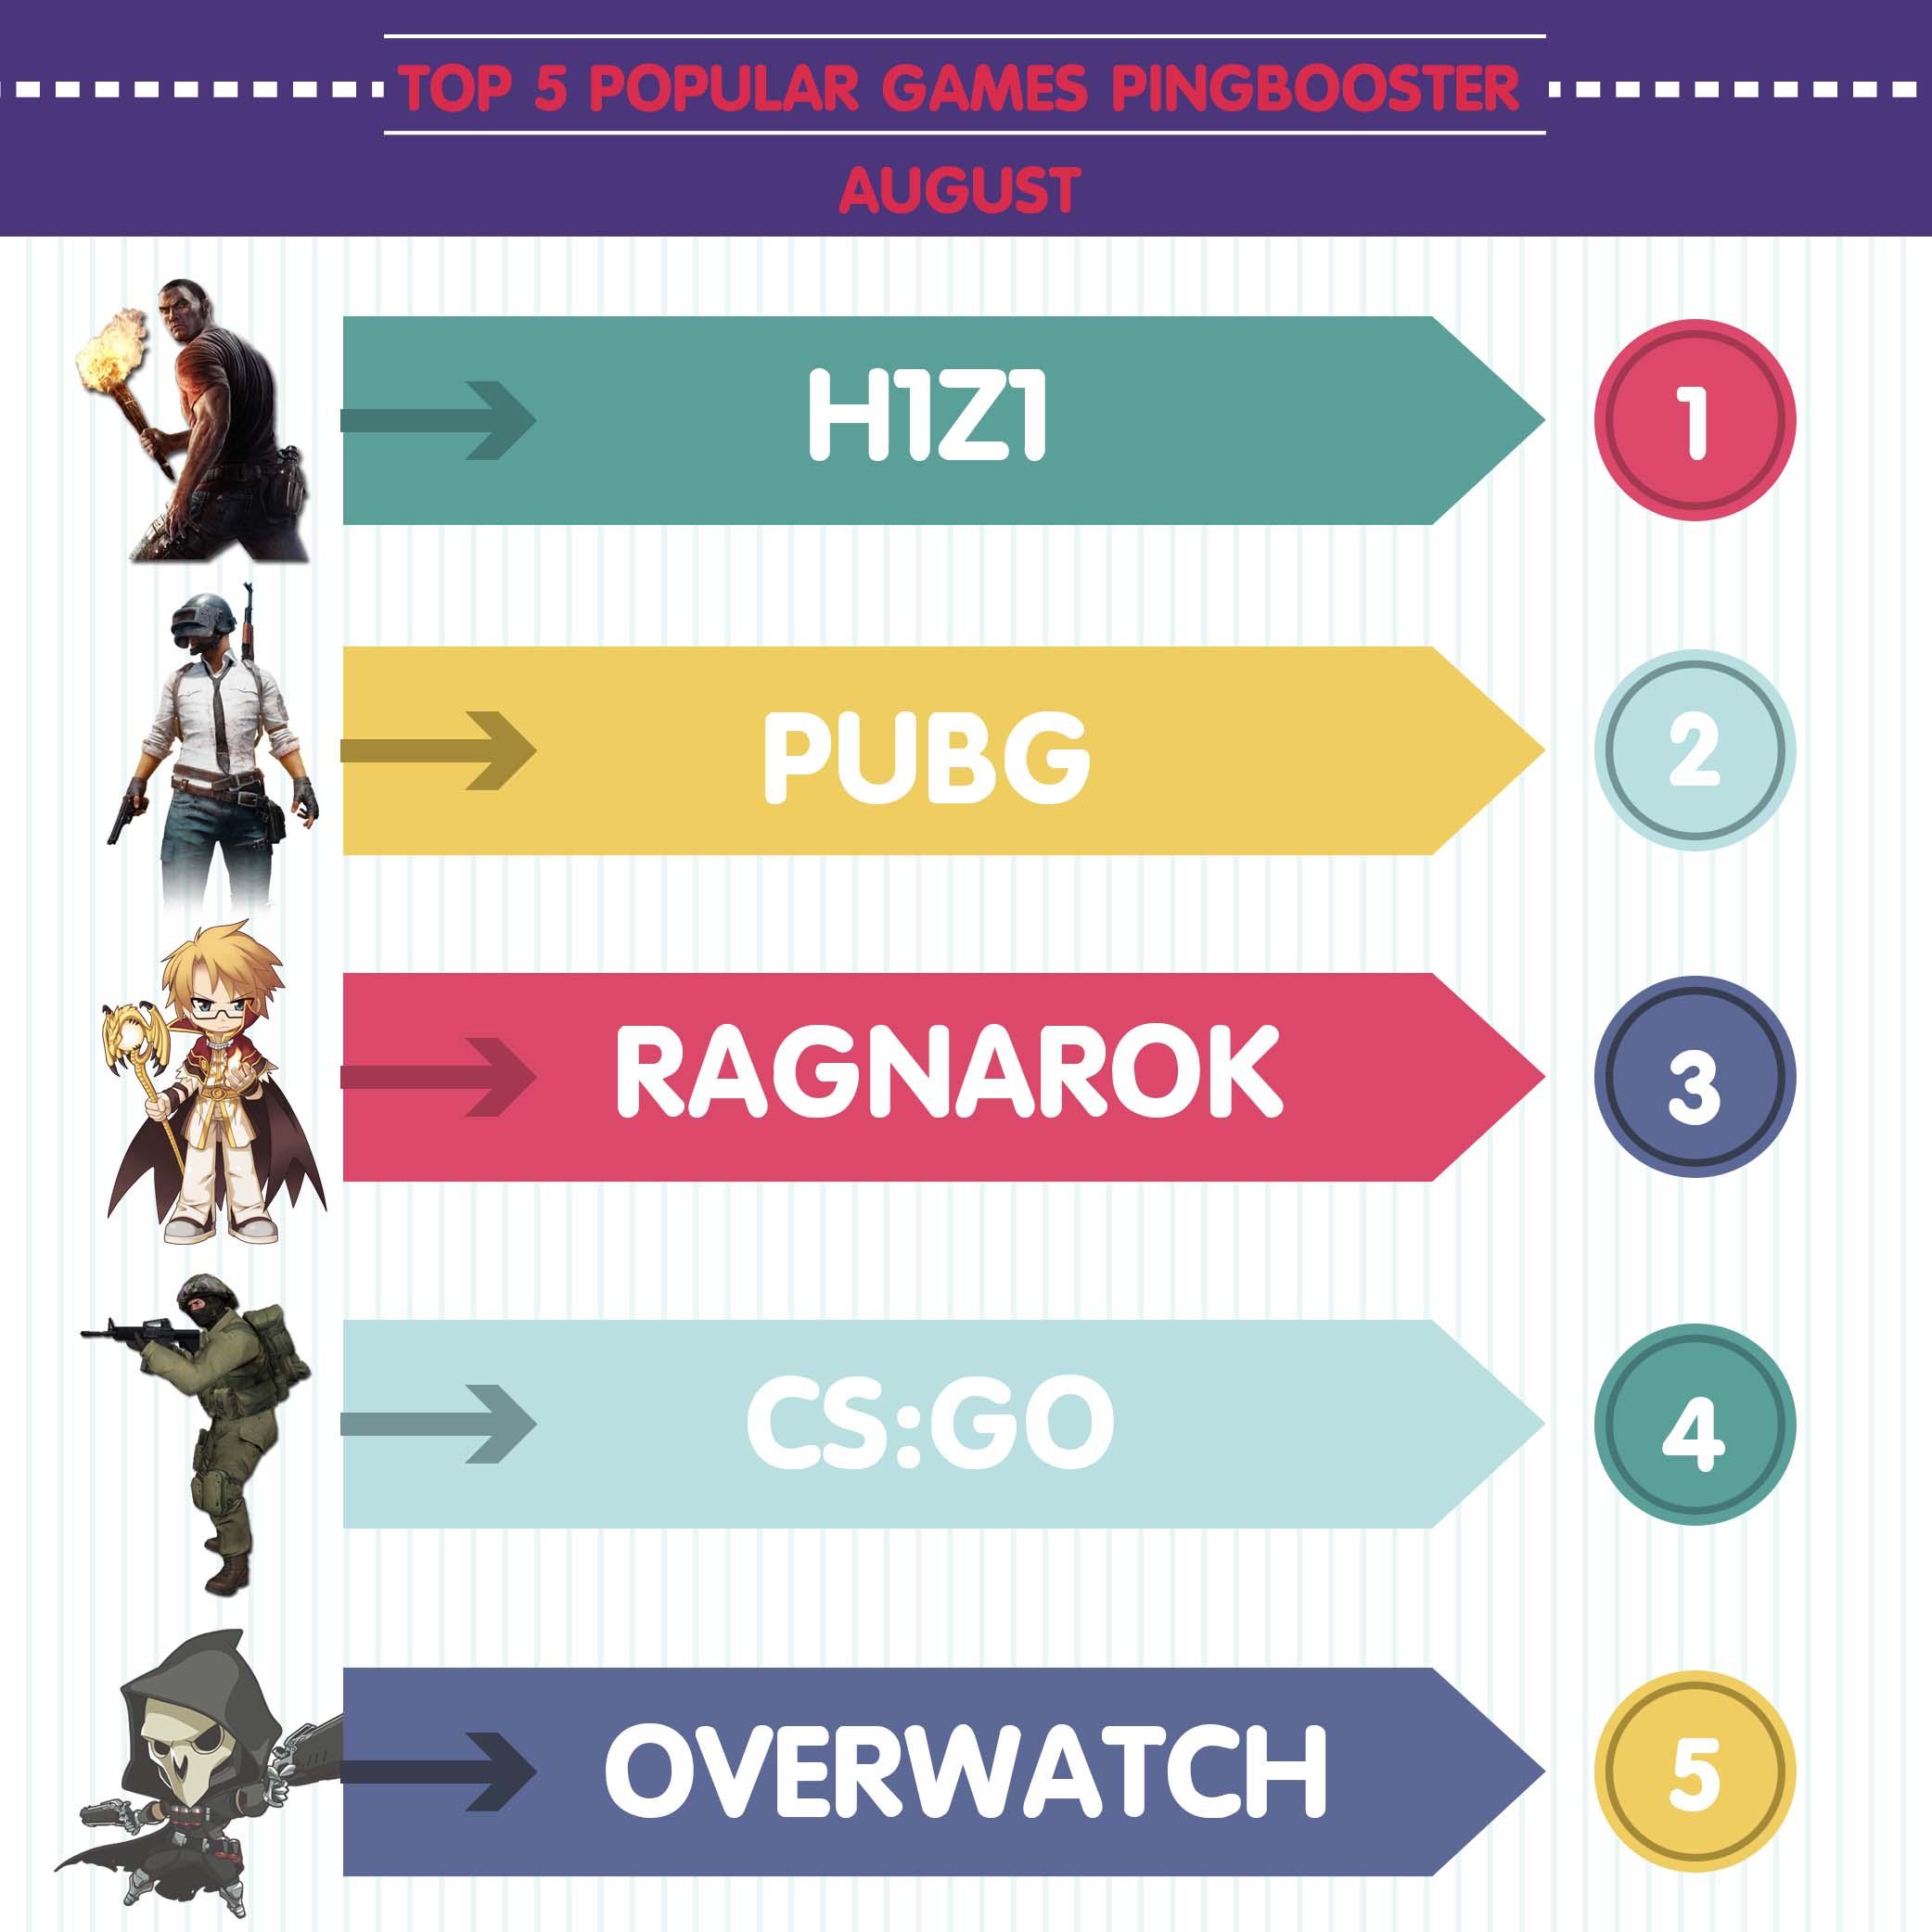 Top 5 เกมยอดนิยมใน PingBooster ประจำเดือน สิงหาคม